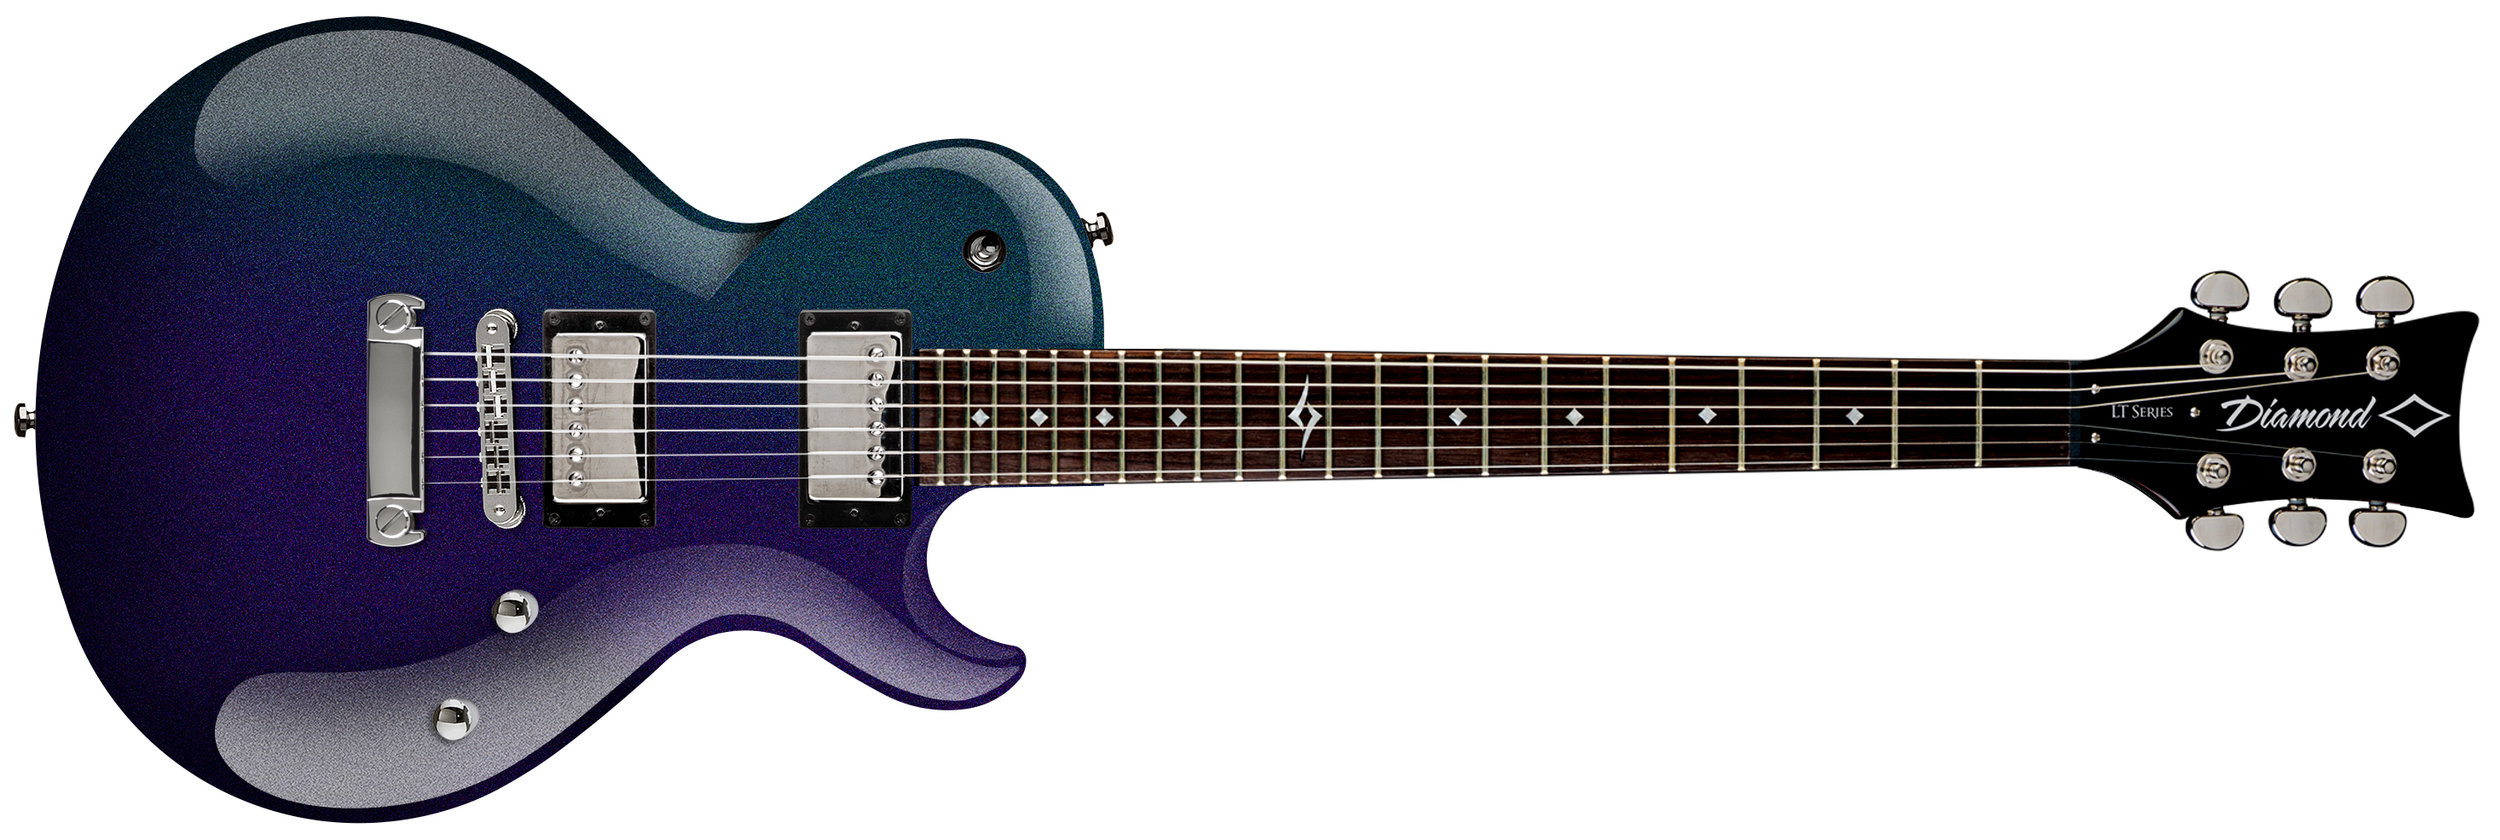 Bolero LT - Galaxy Purple